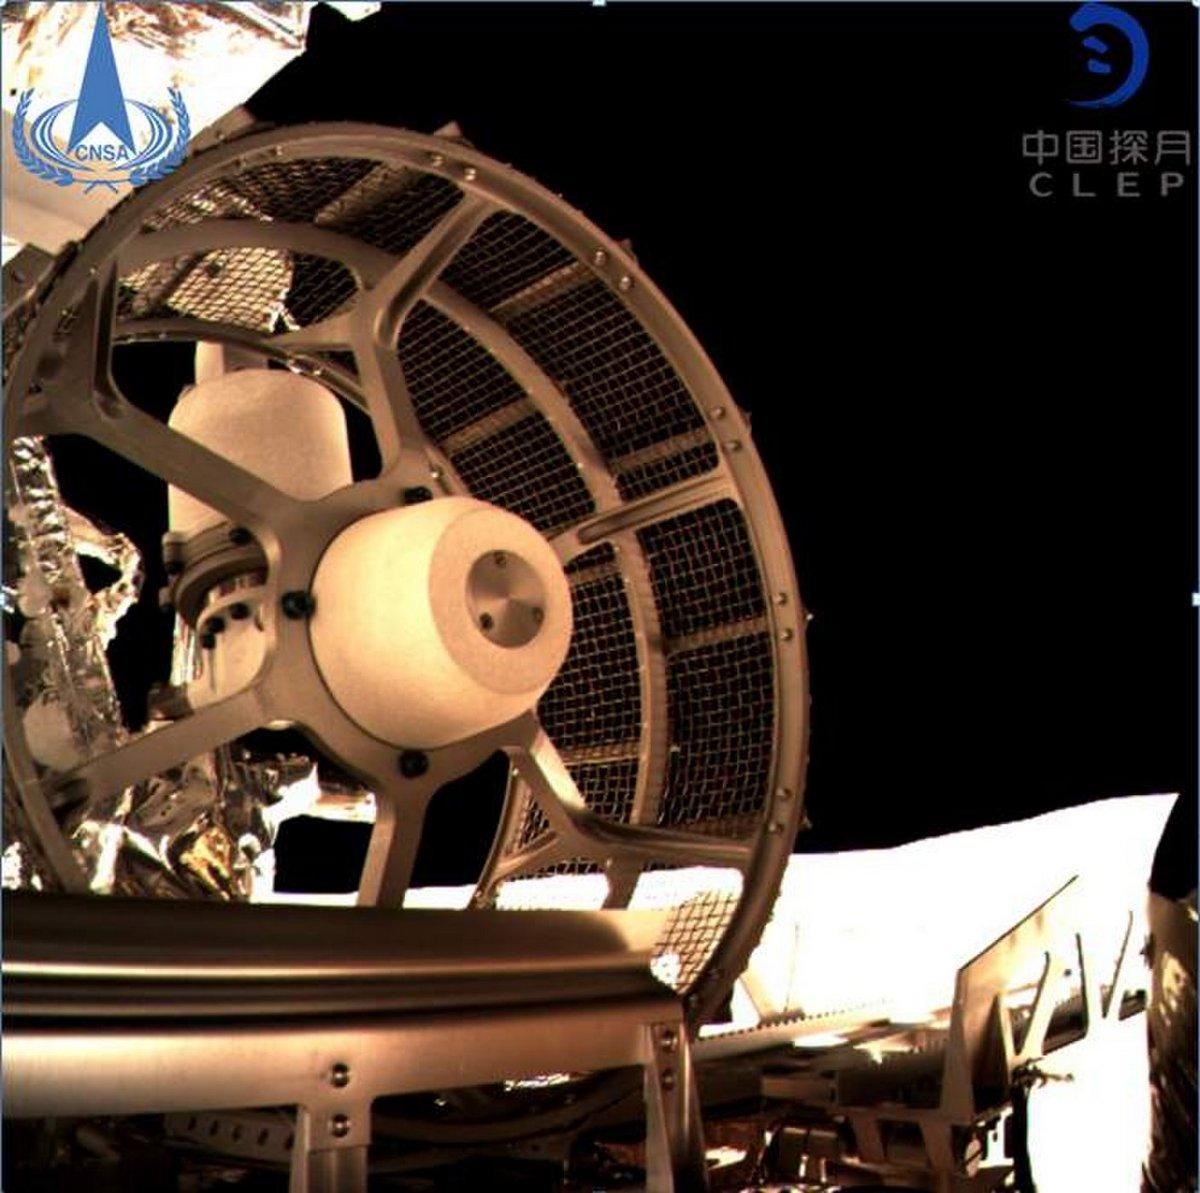 Спуск китайского лунохода Yutu-2